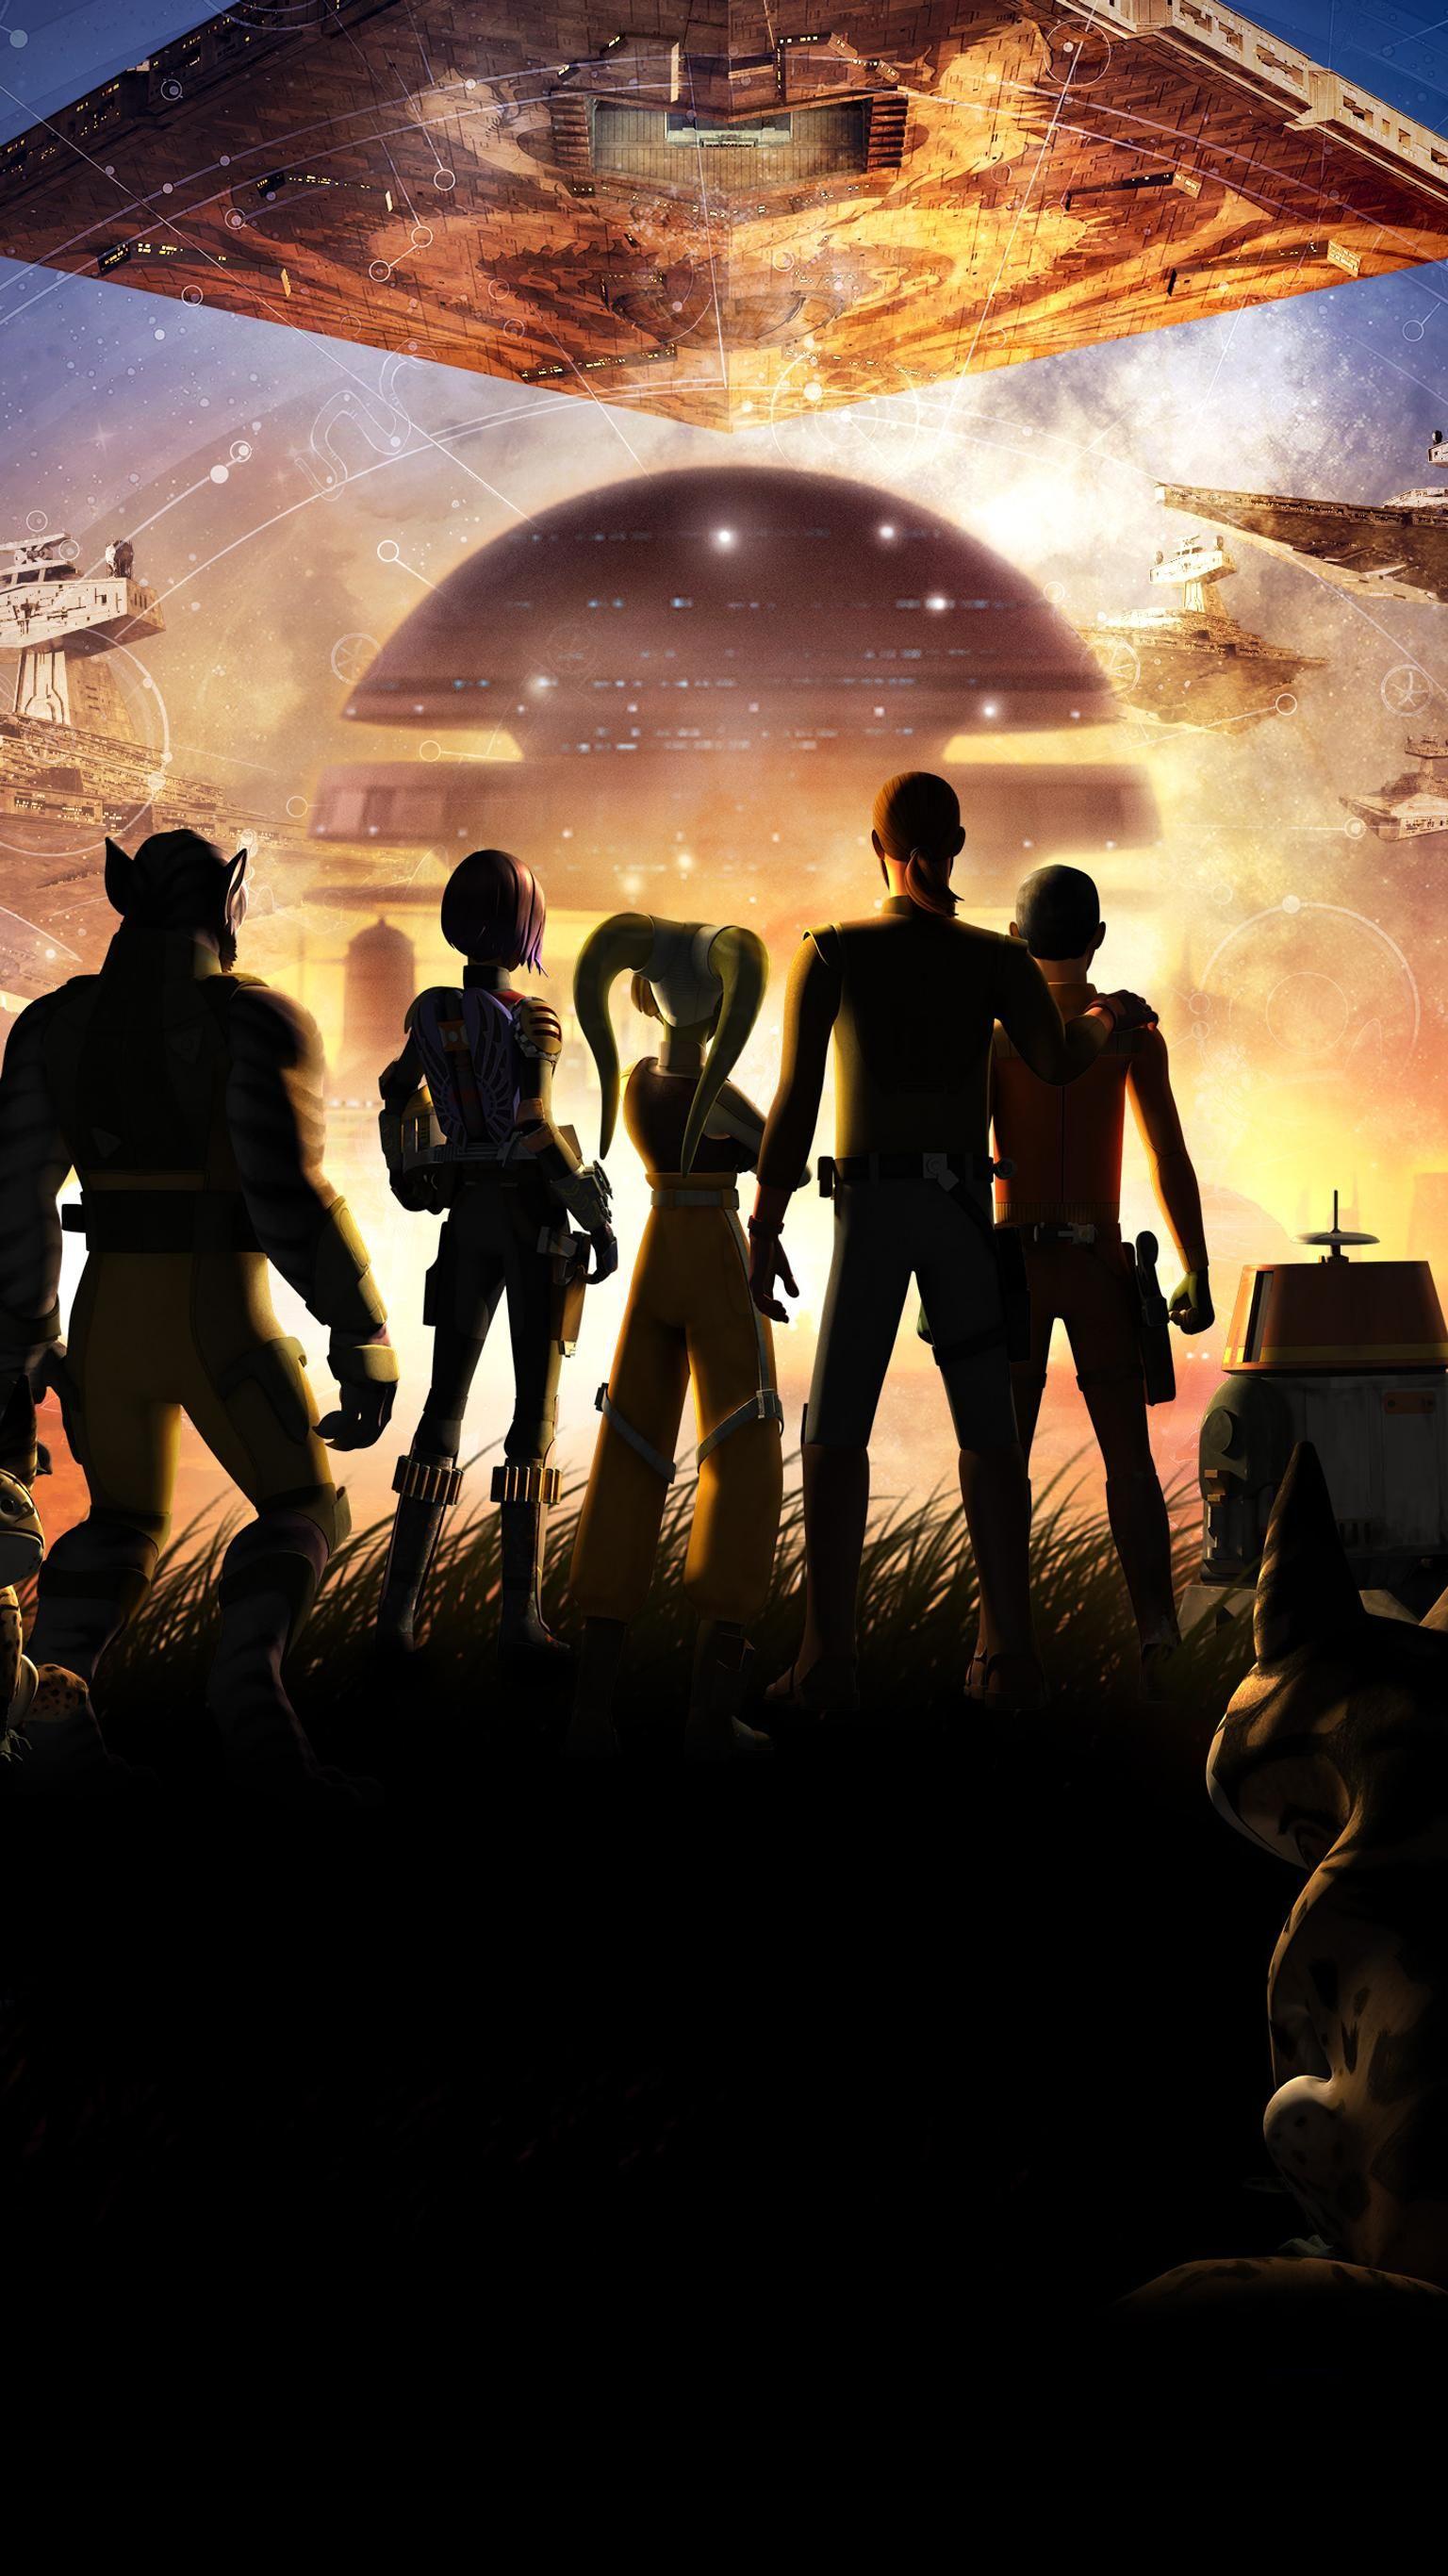 Star Wars Rebels Phone Wallpaper Moviemania Star Wars Watch Star Wars Poster Star Wars Rebels